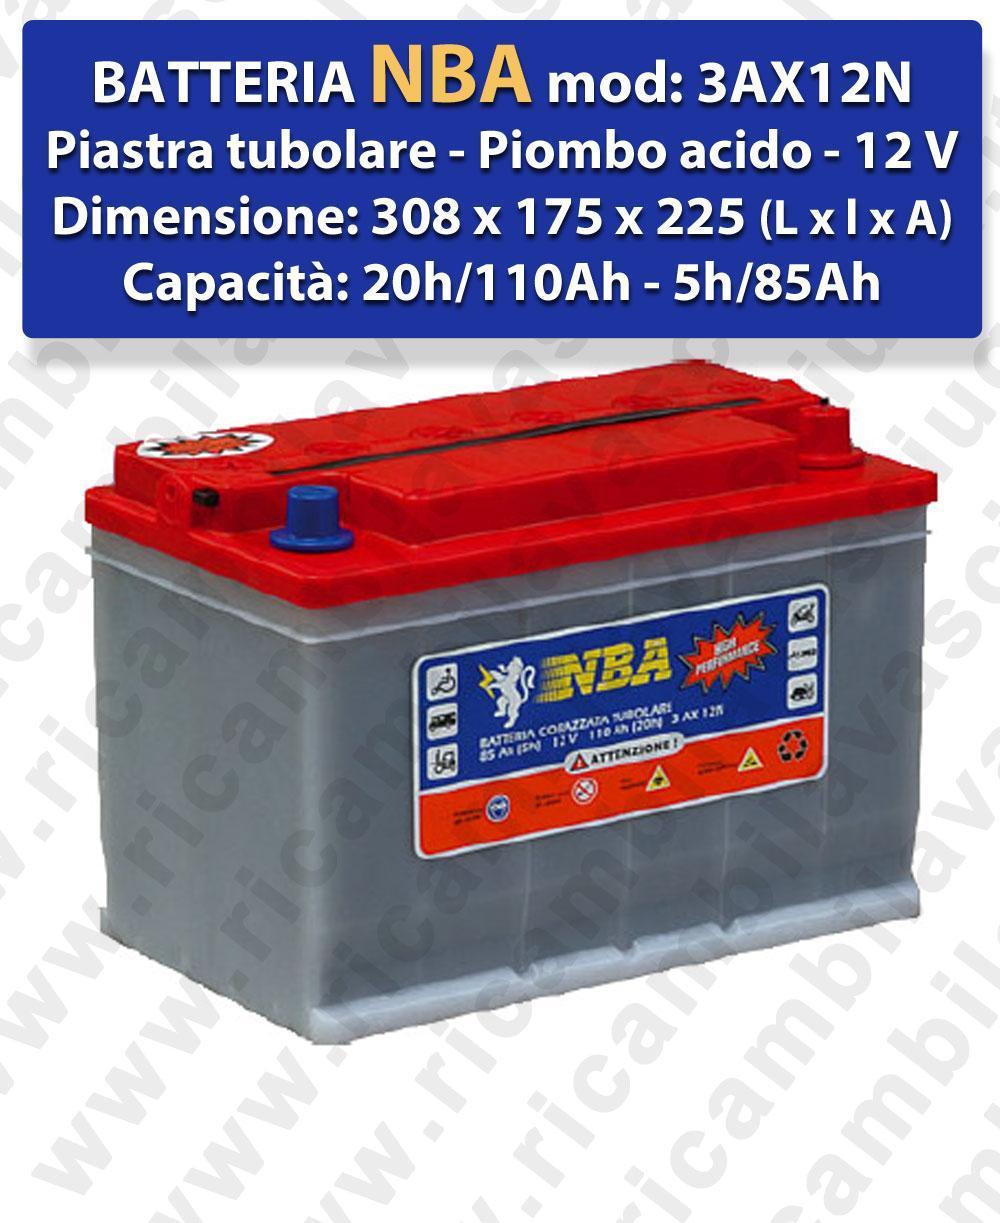 3AX12N Blei Batterie 12V 110Ah 20/h NBA